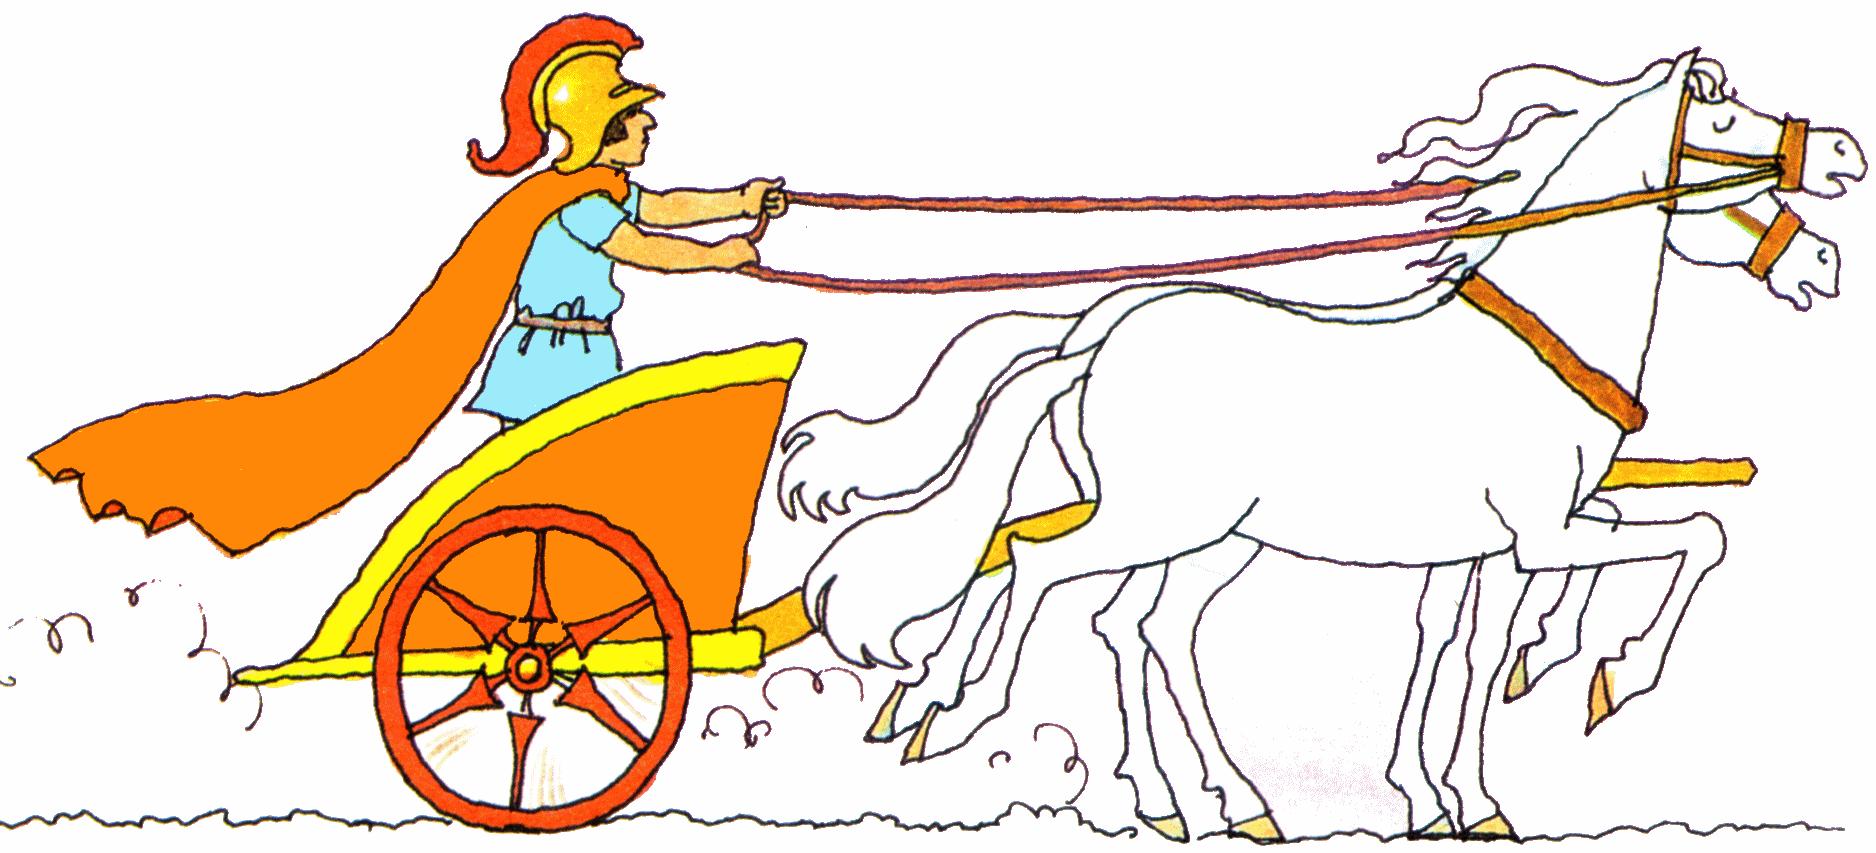 Картинка колесница раскраска